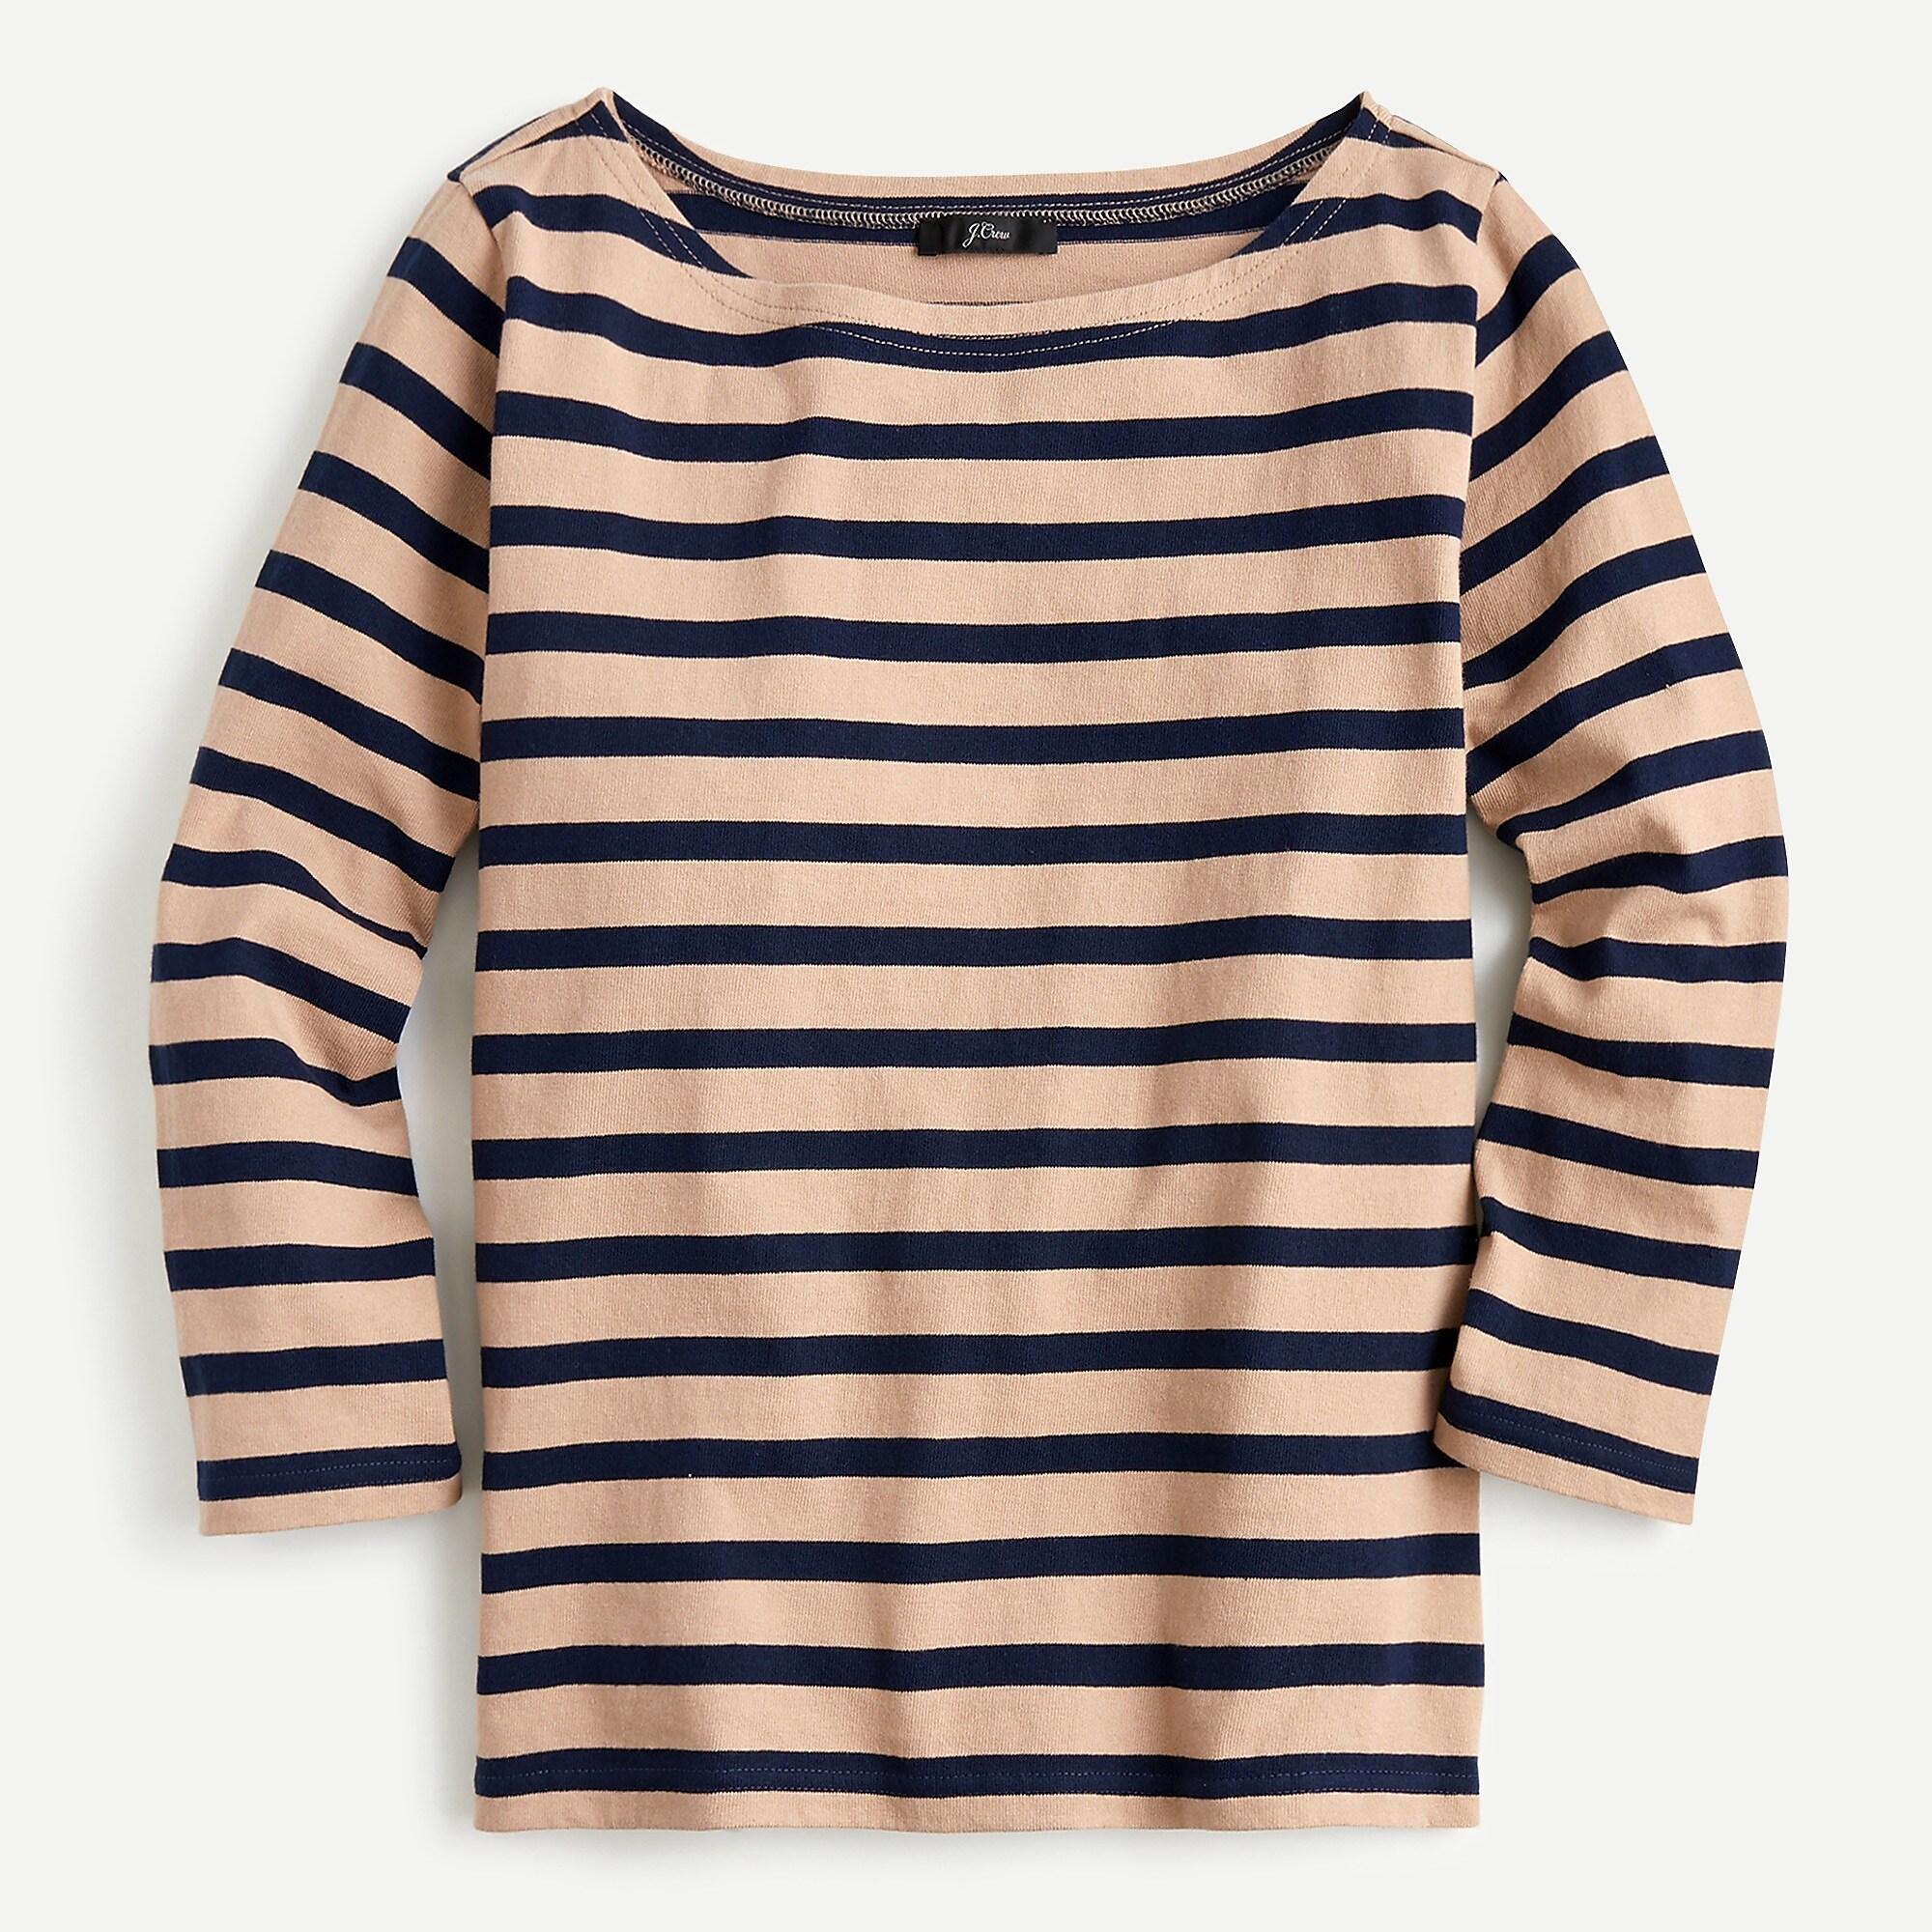 Structured boatneck T-shirt in stripe | J.Crew US